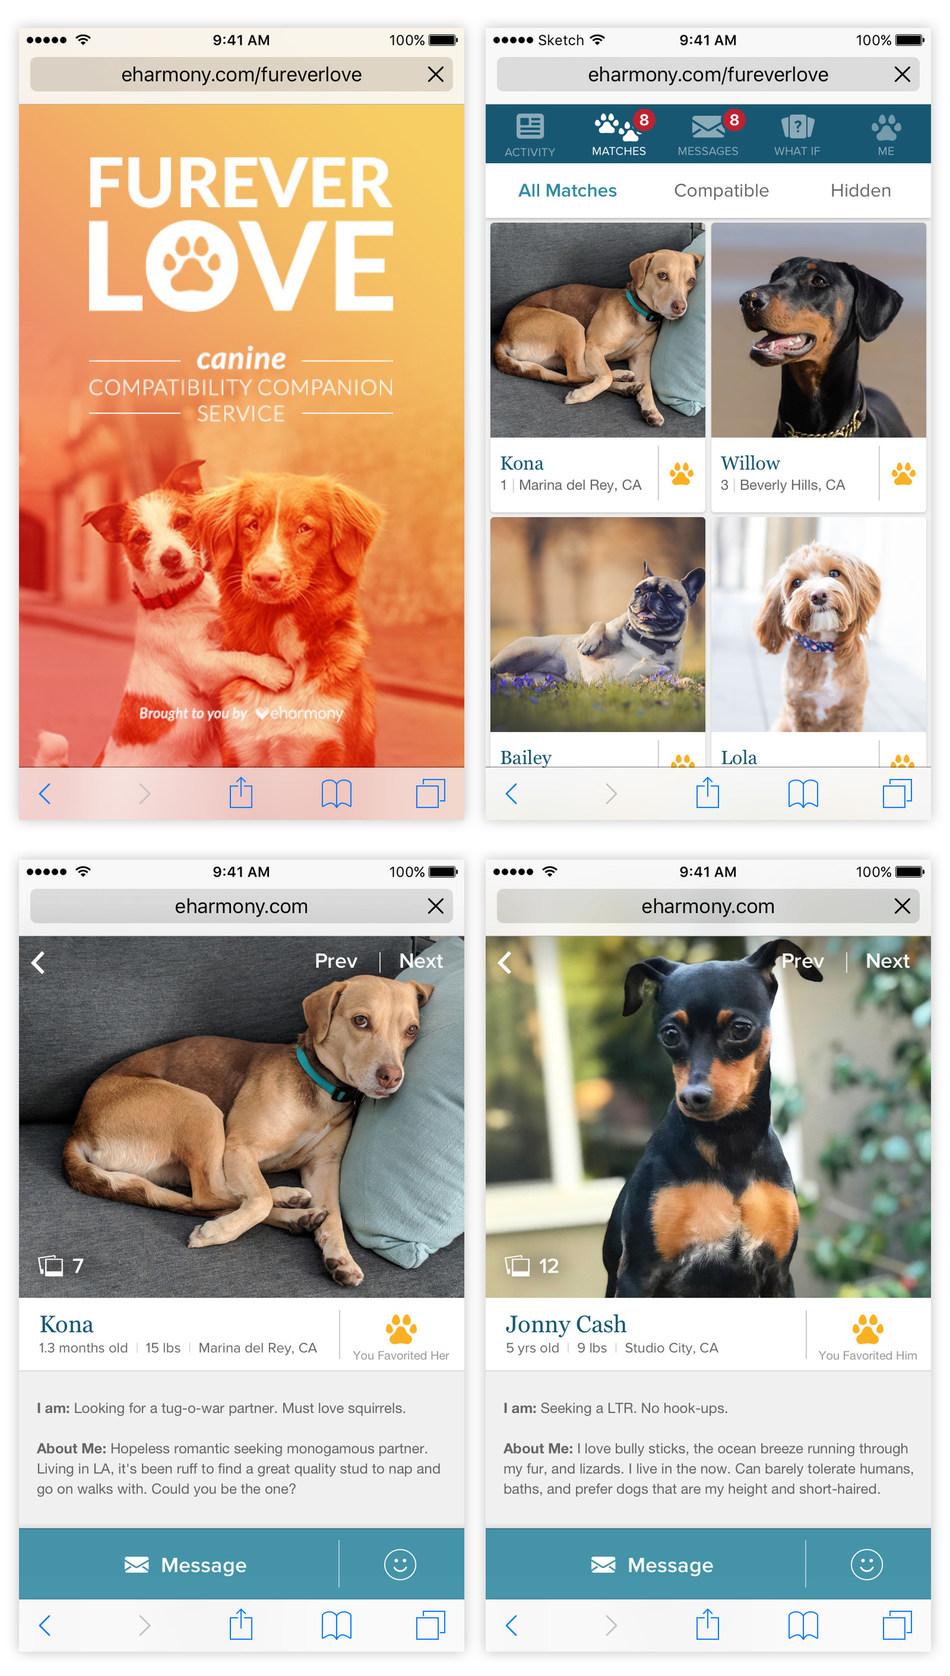 eharmony introduces Furever Love, a canine compatibility companion service